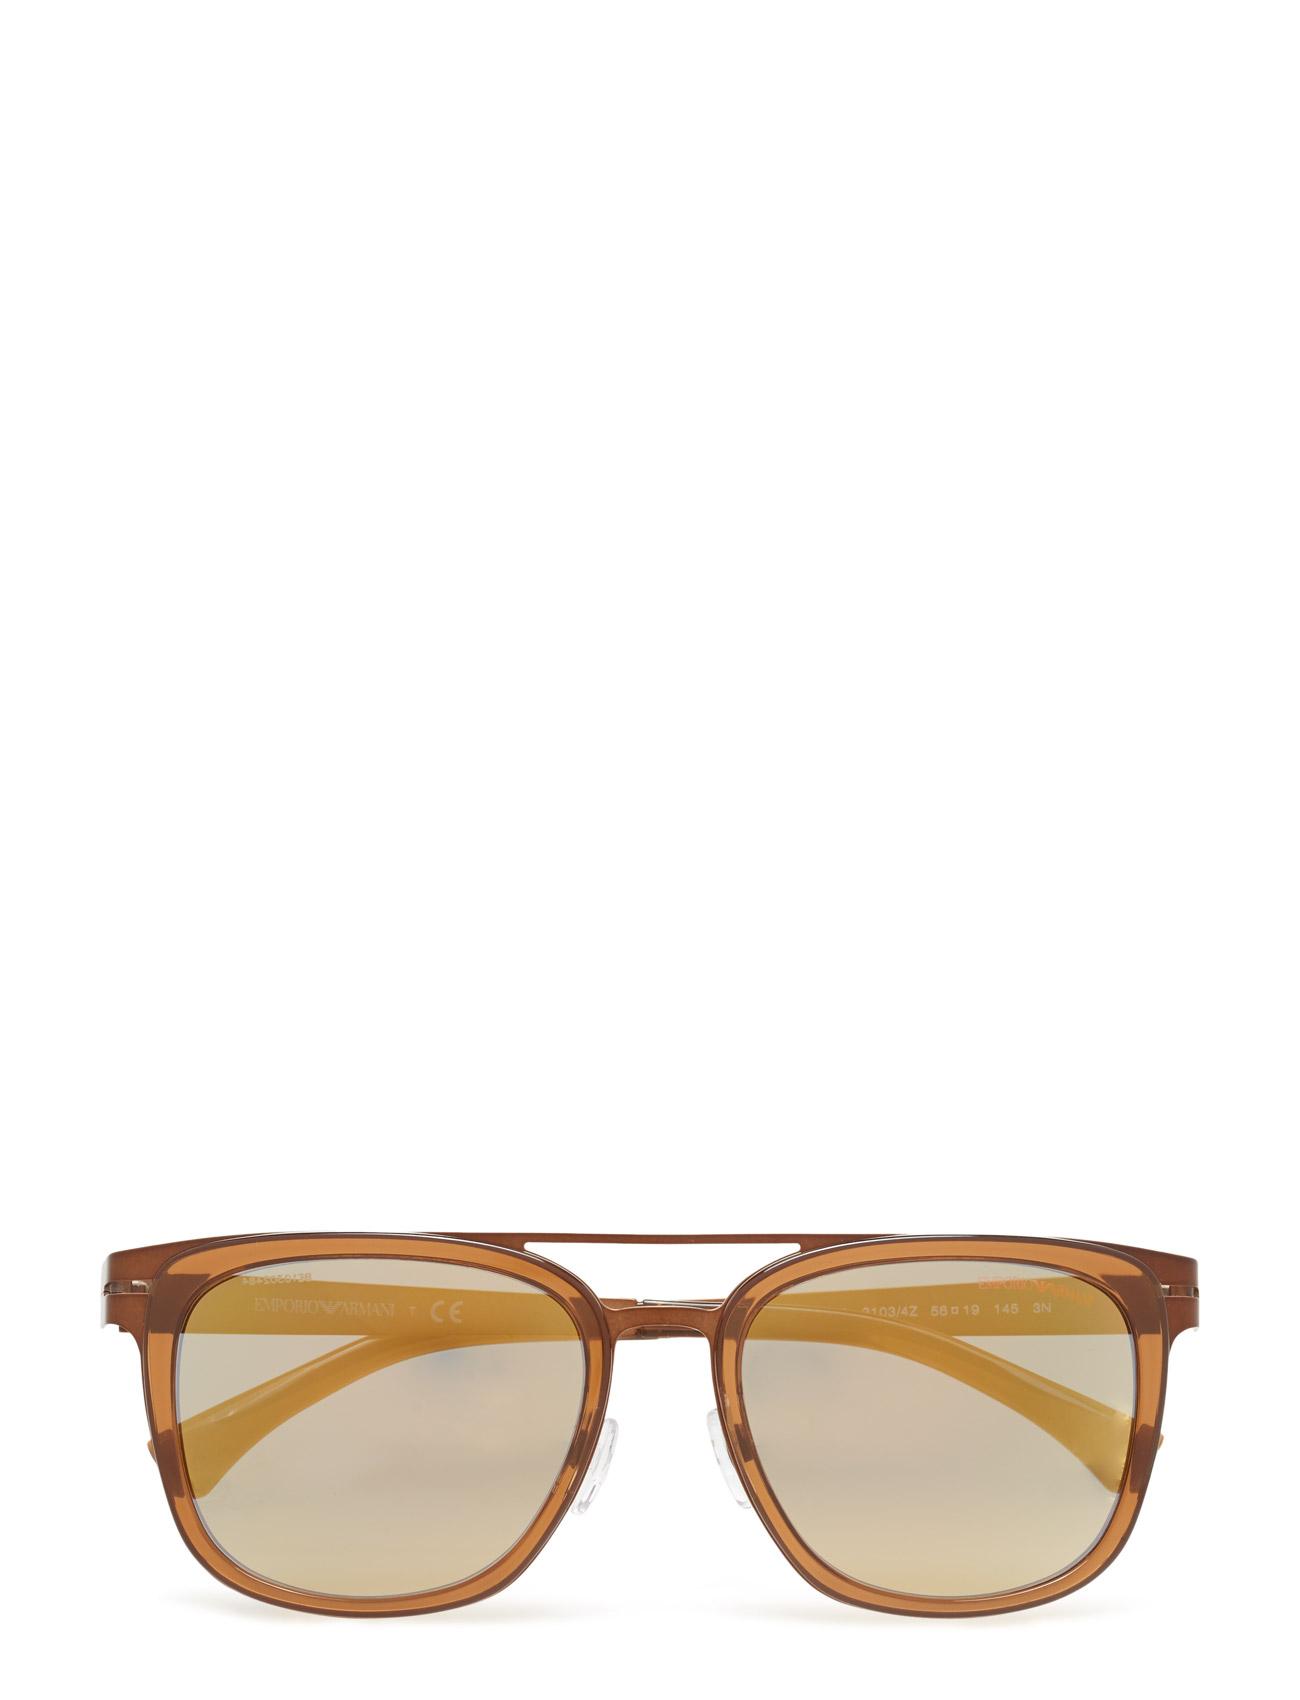 Trend Emporio Armani Sunglasses Accessories til Mænd i